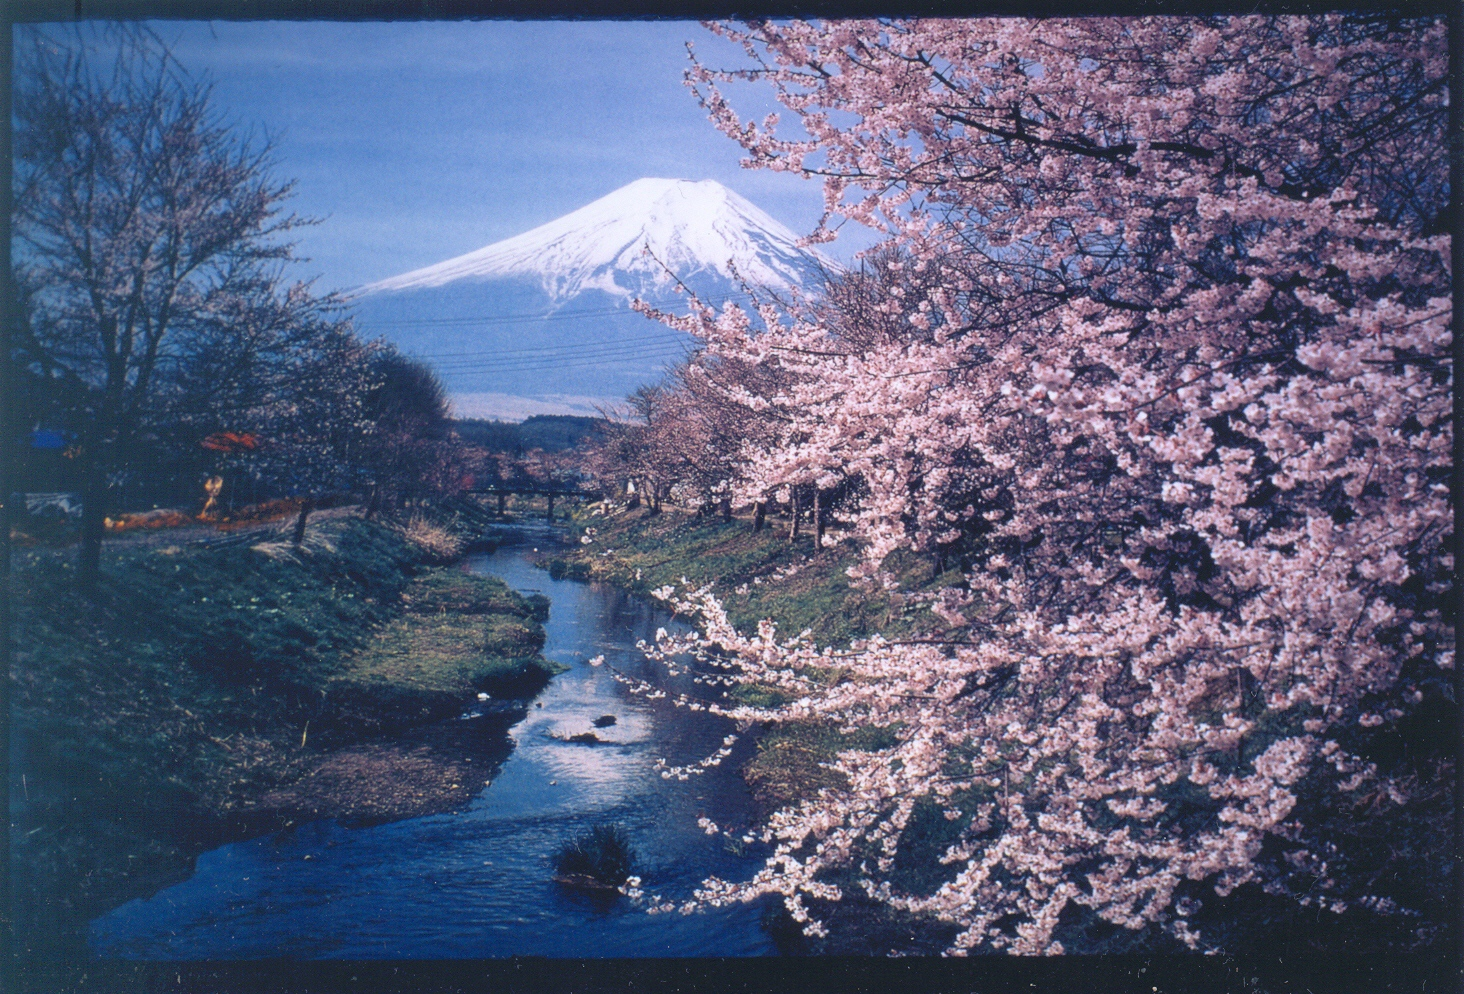 monte fuji japon